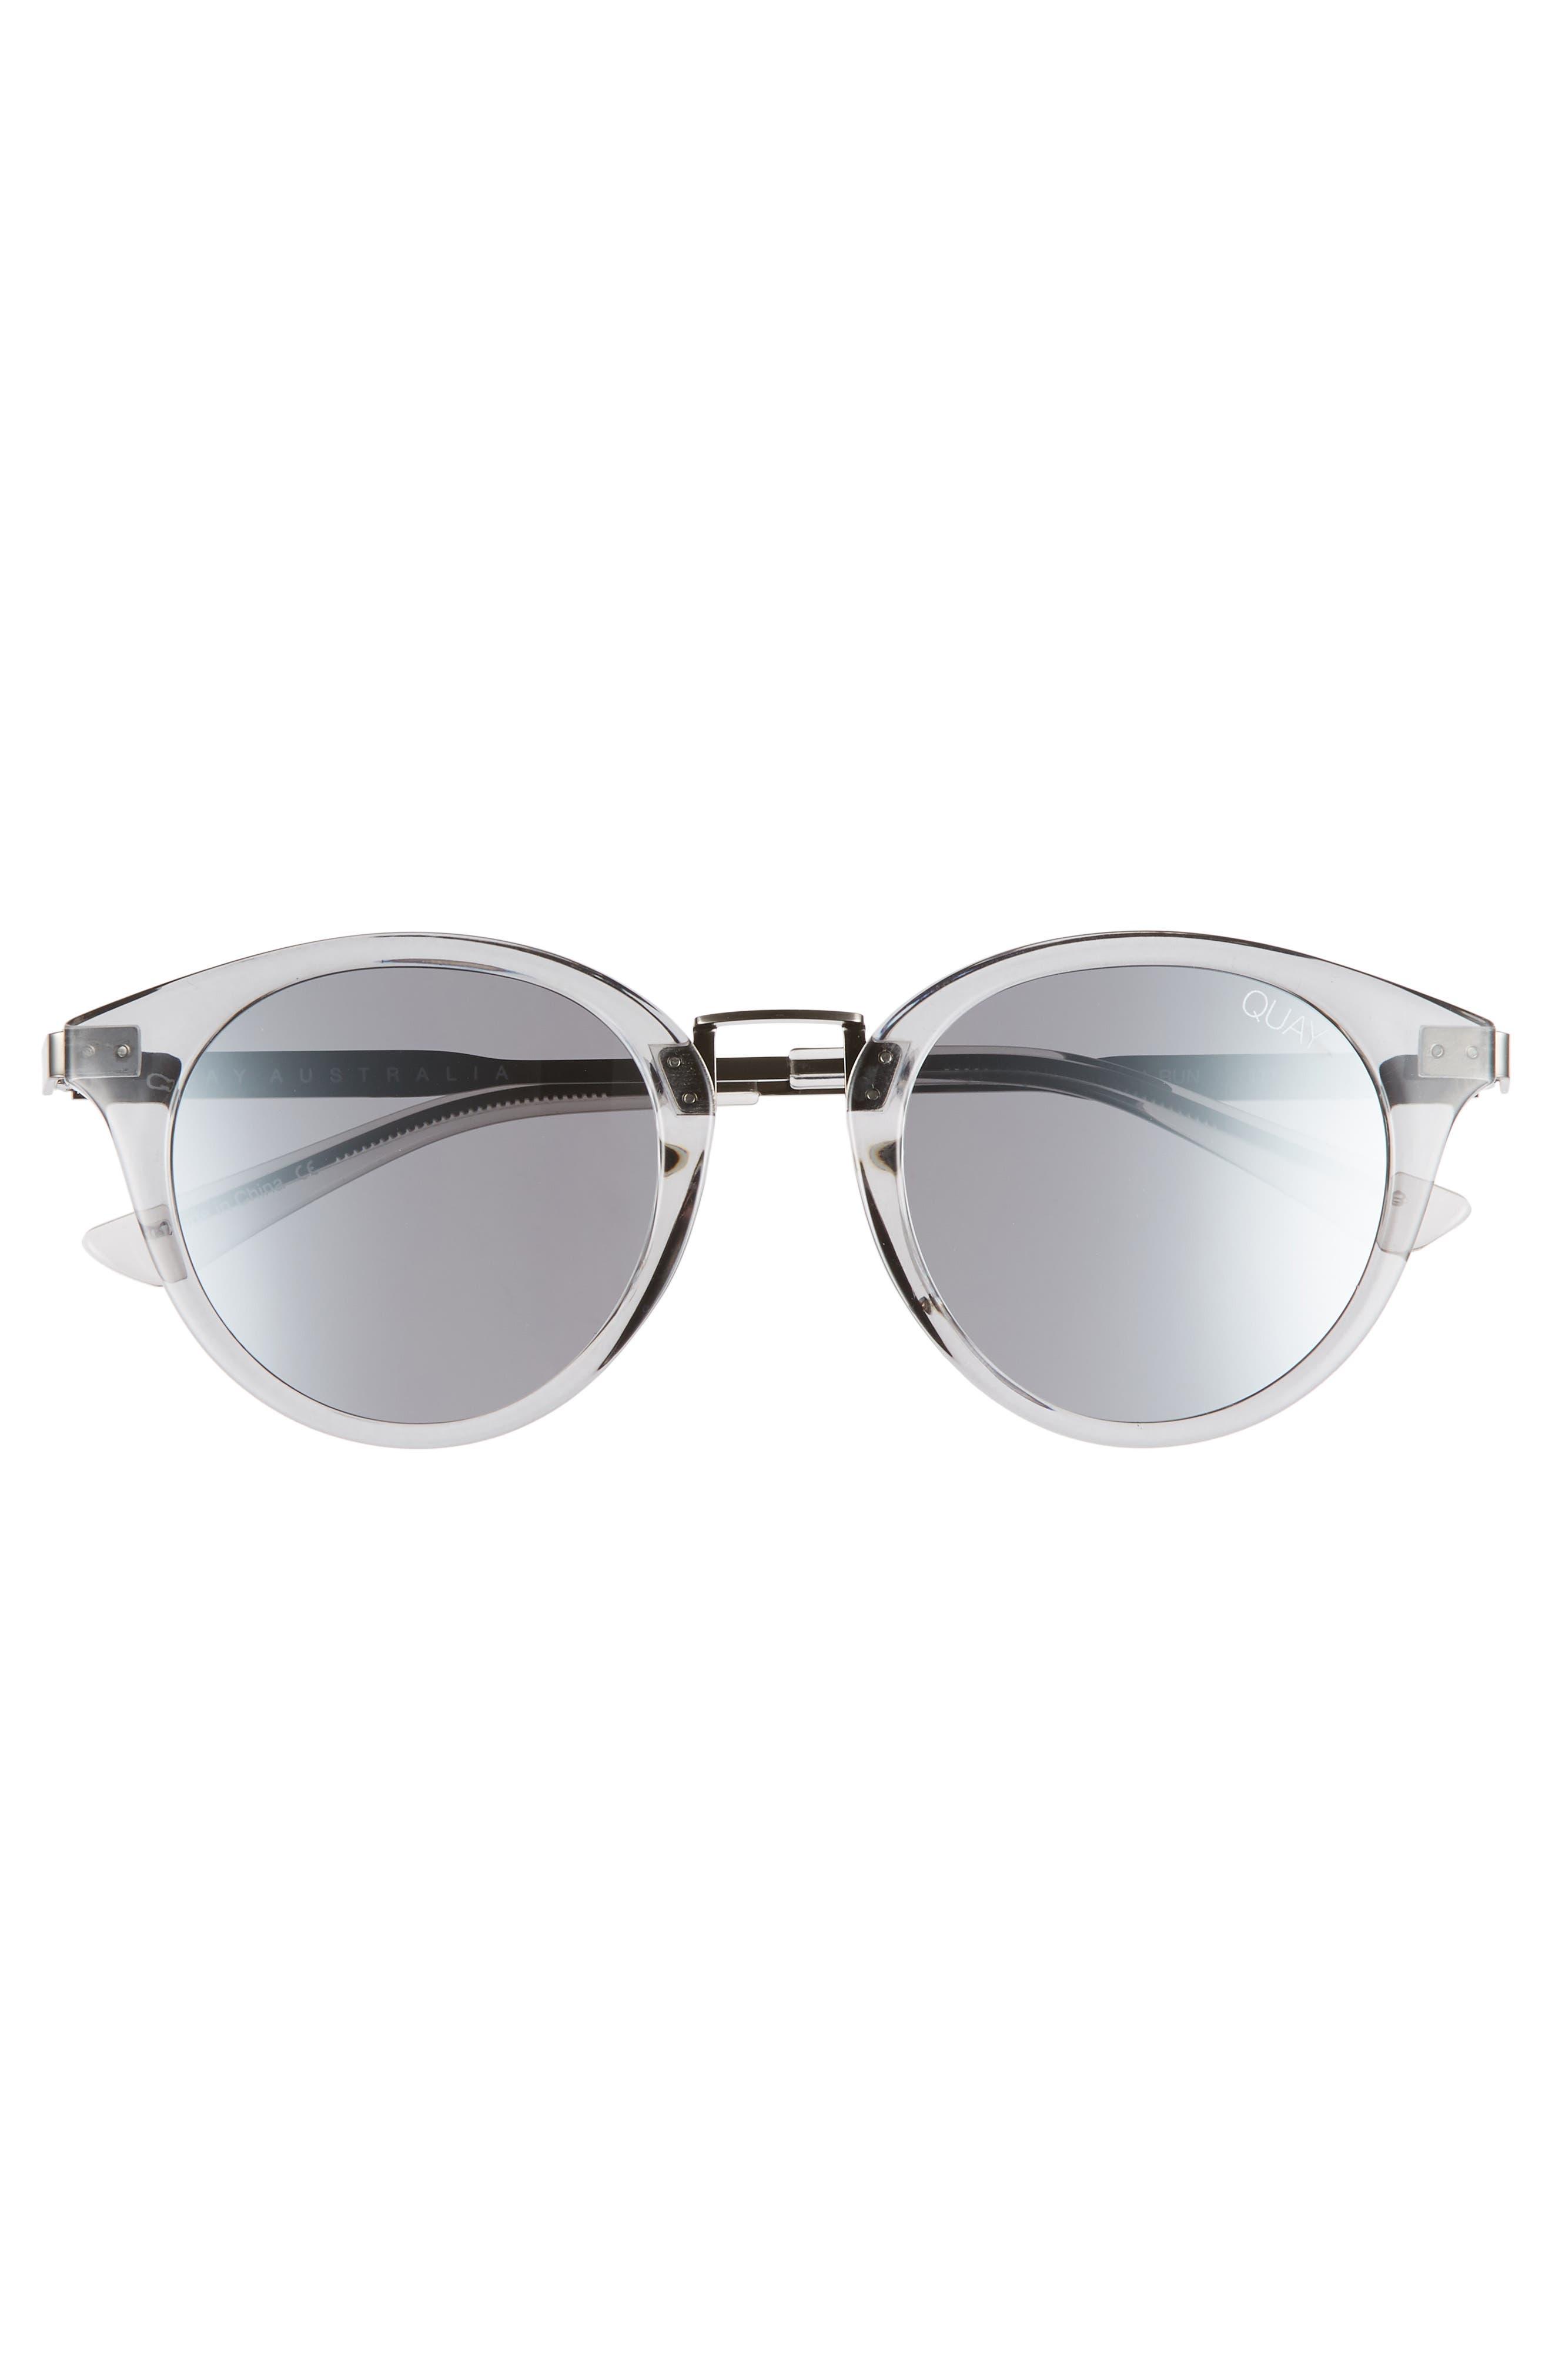 Gotta Run 48mm Sunglasses,                             Alternate thumbnail 3, color,                             Grey/ Silver